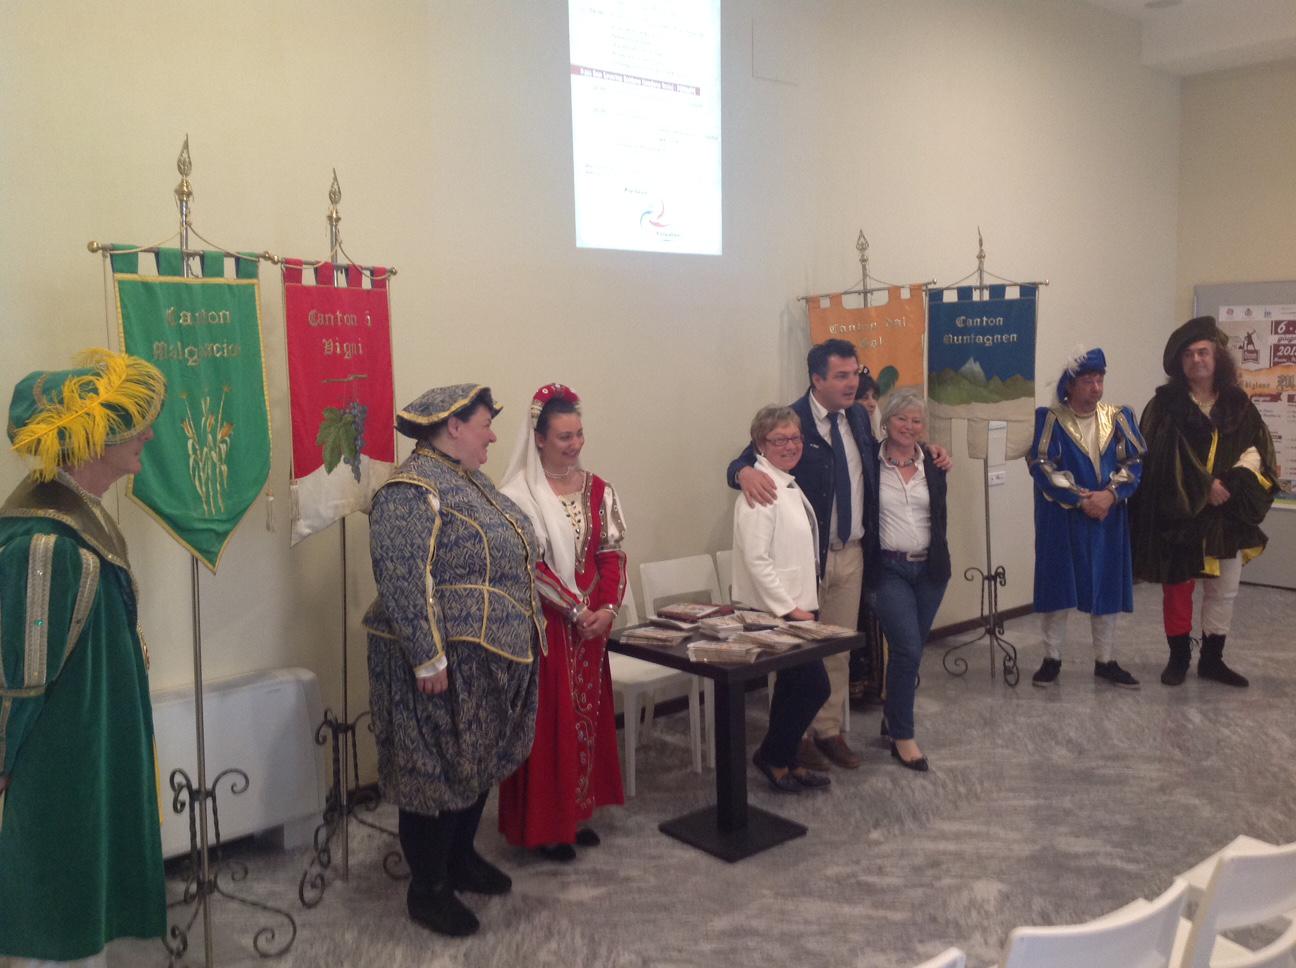 Prima Festa medievale: a Novara e Pernate il 6 e 7 giugno